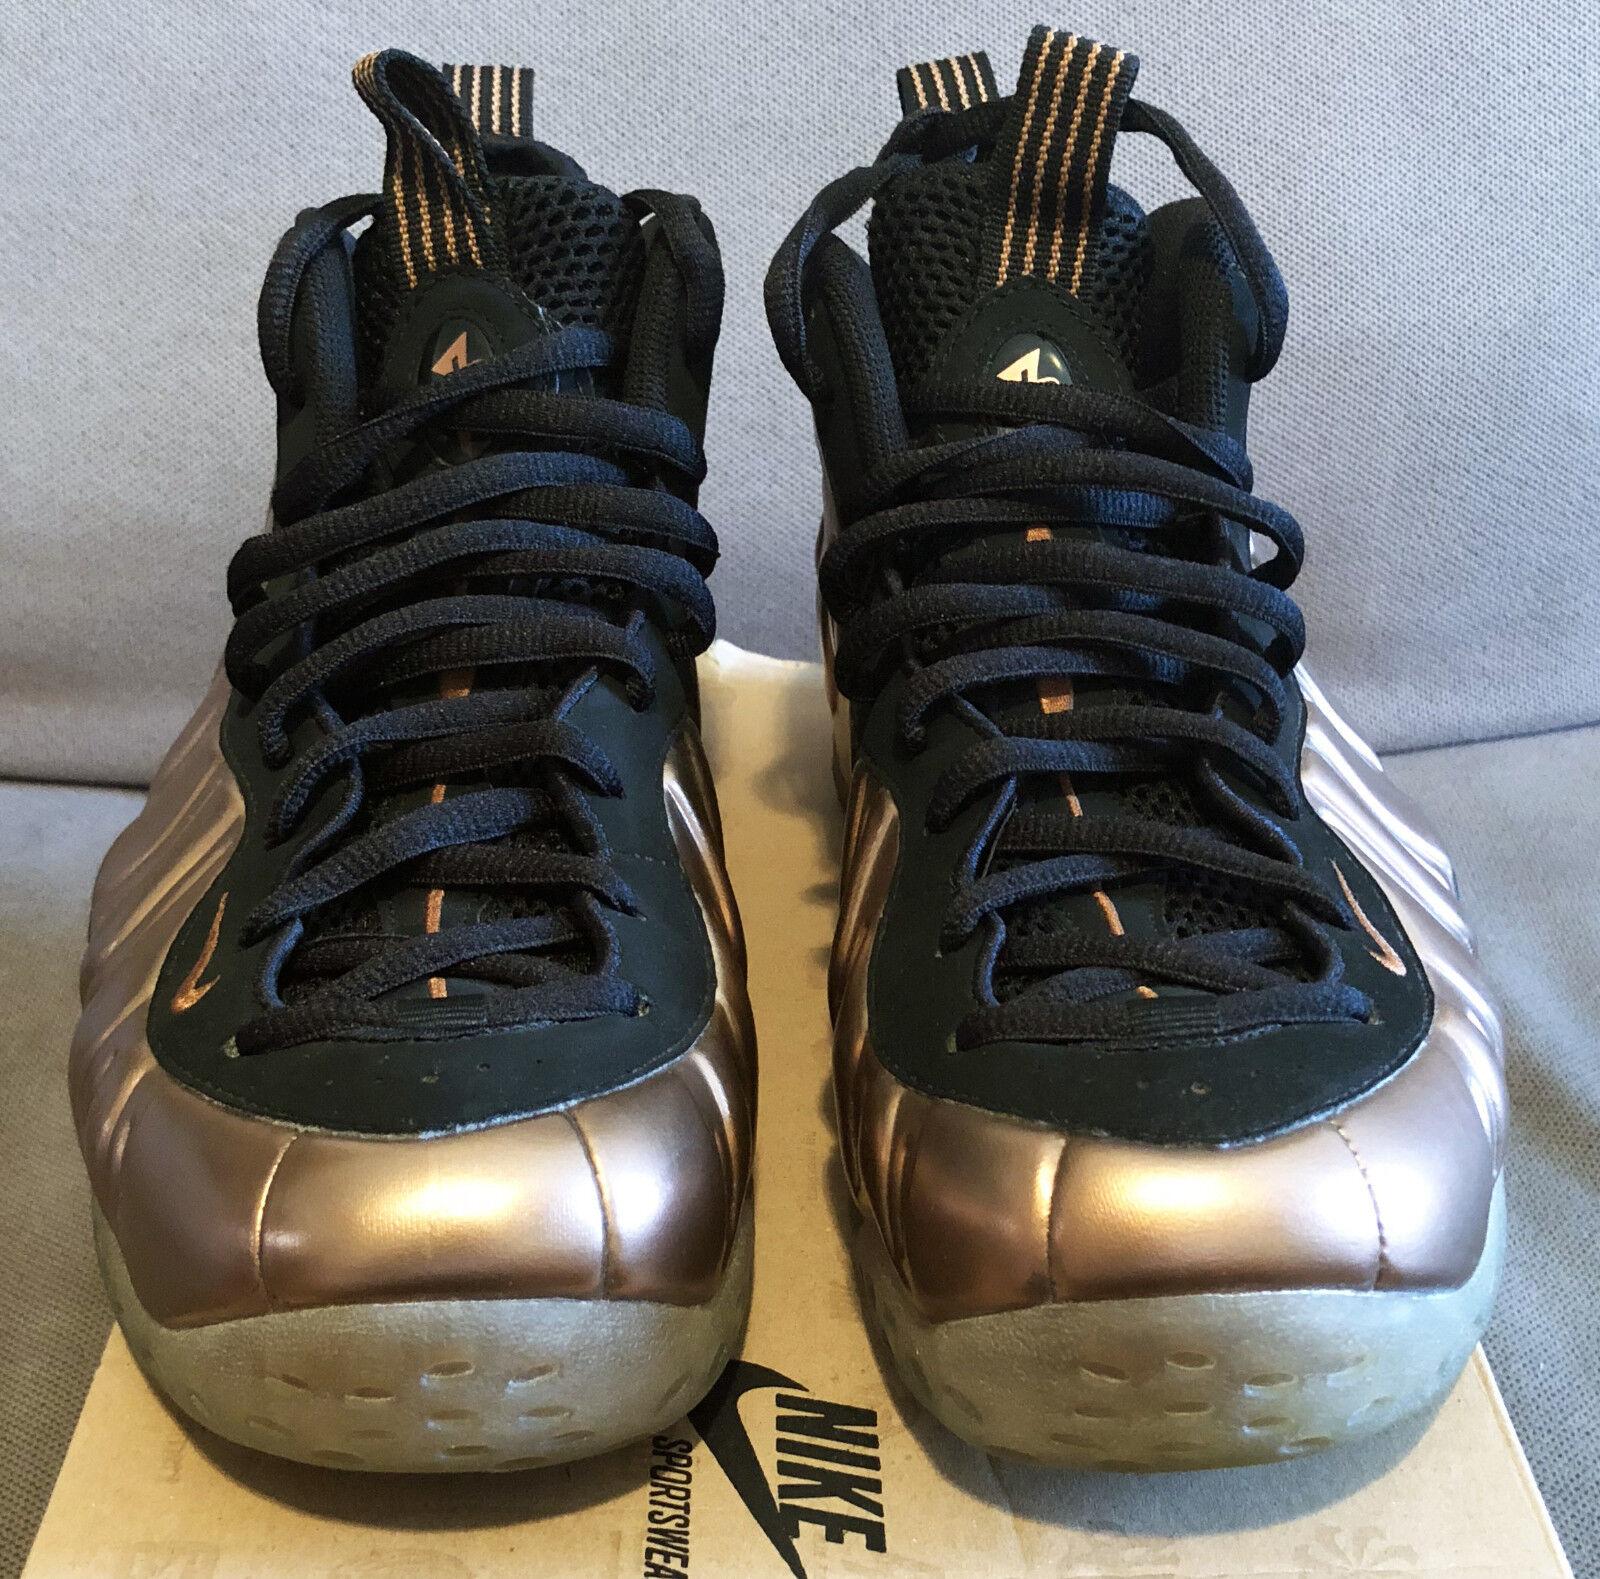 2010 Nike Air Foamposite One Black Metallic Copper sz 9 314996 081